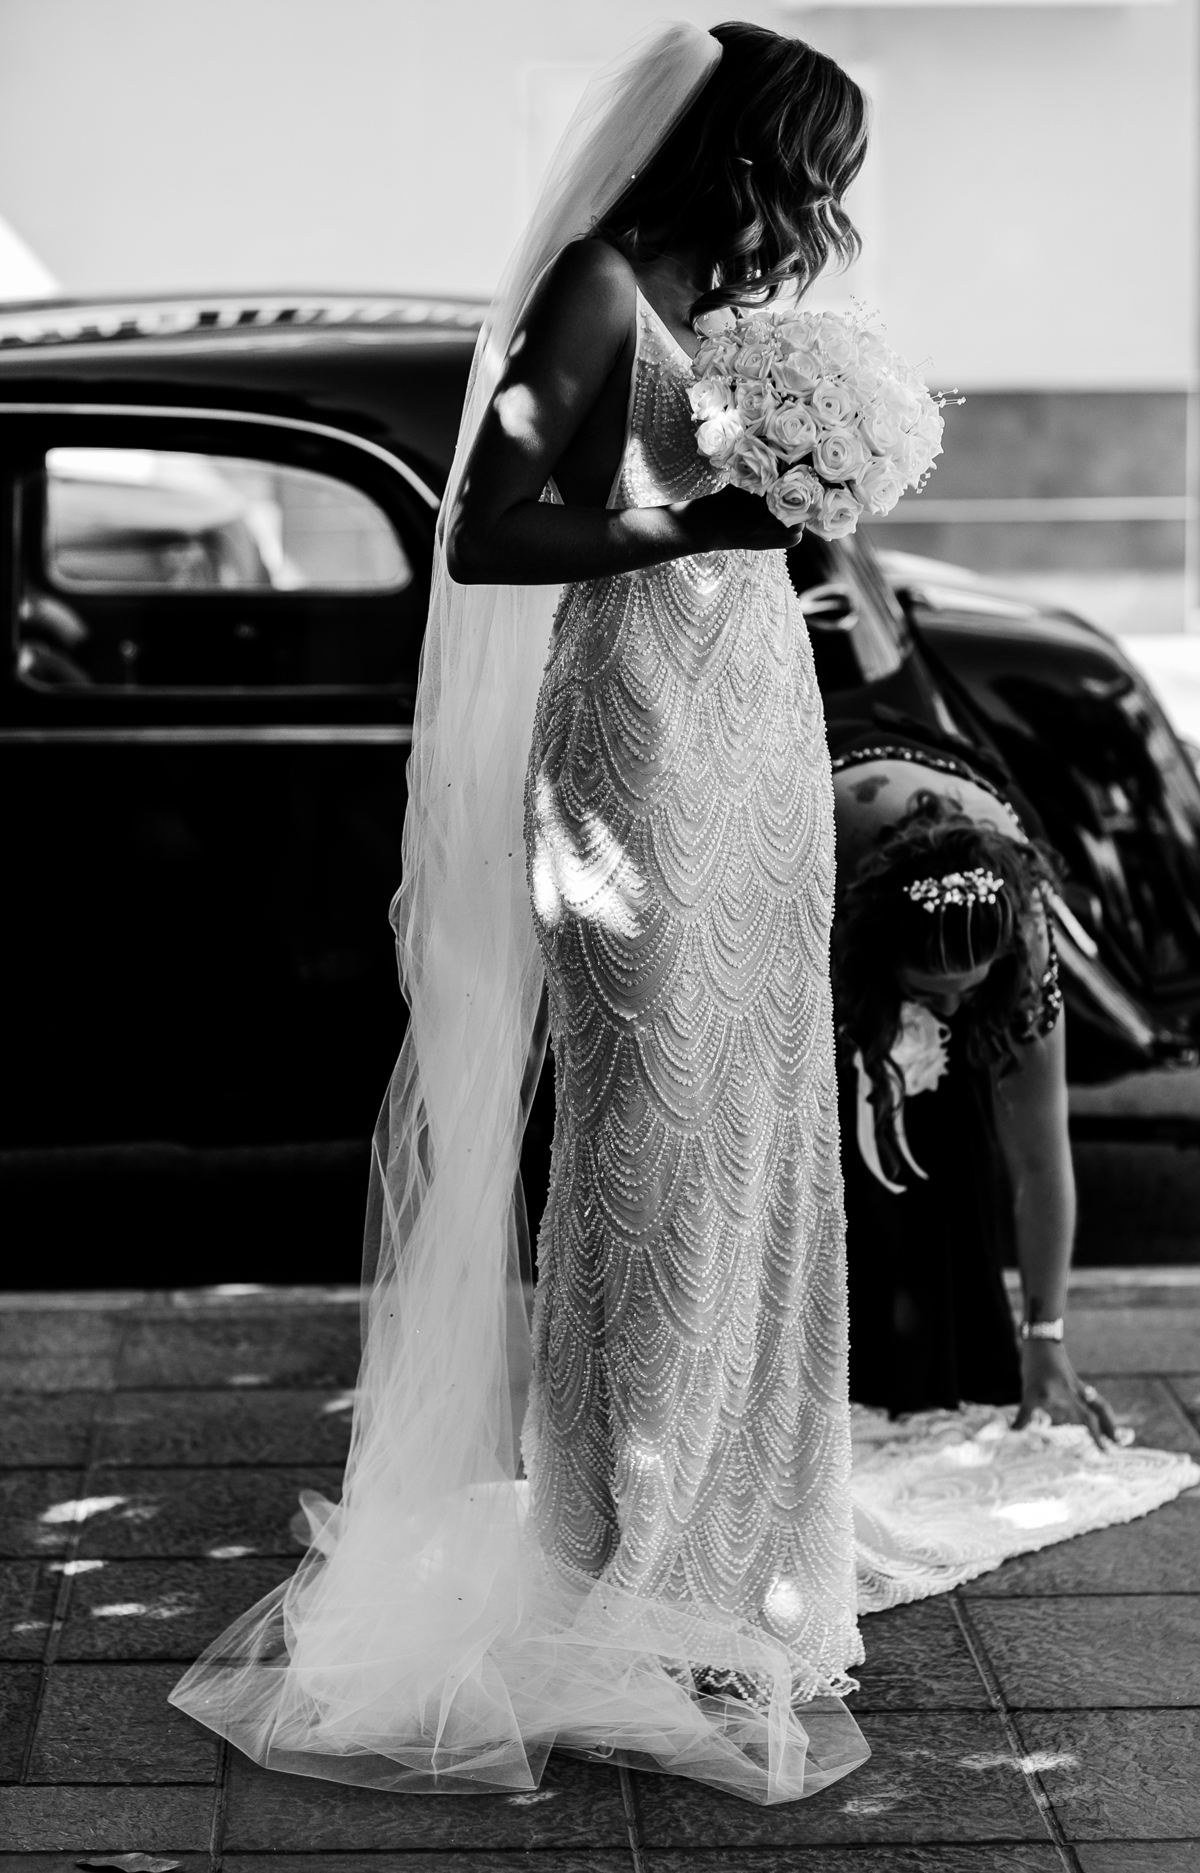 Wedding photographer Marbella Malaga Spain bride